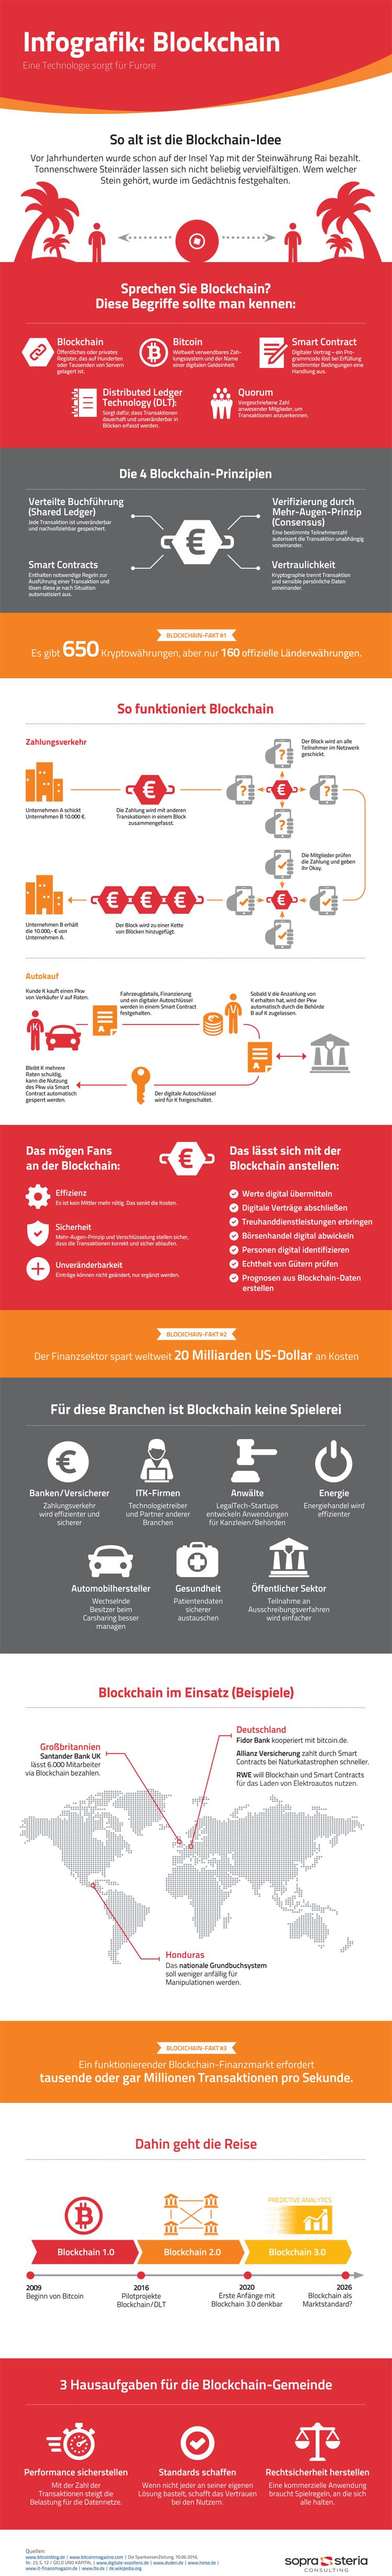 Infografik Blockchain-Technologie